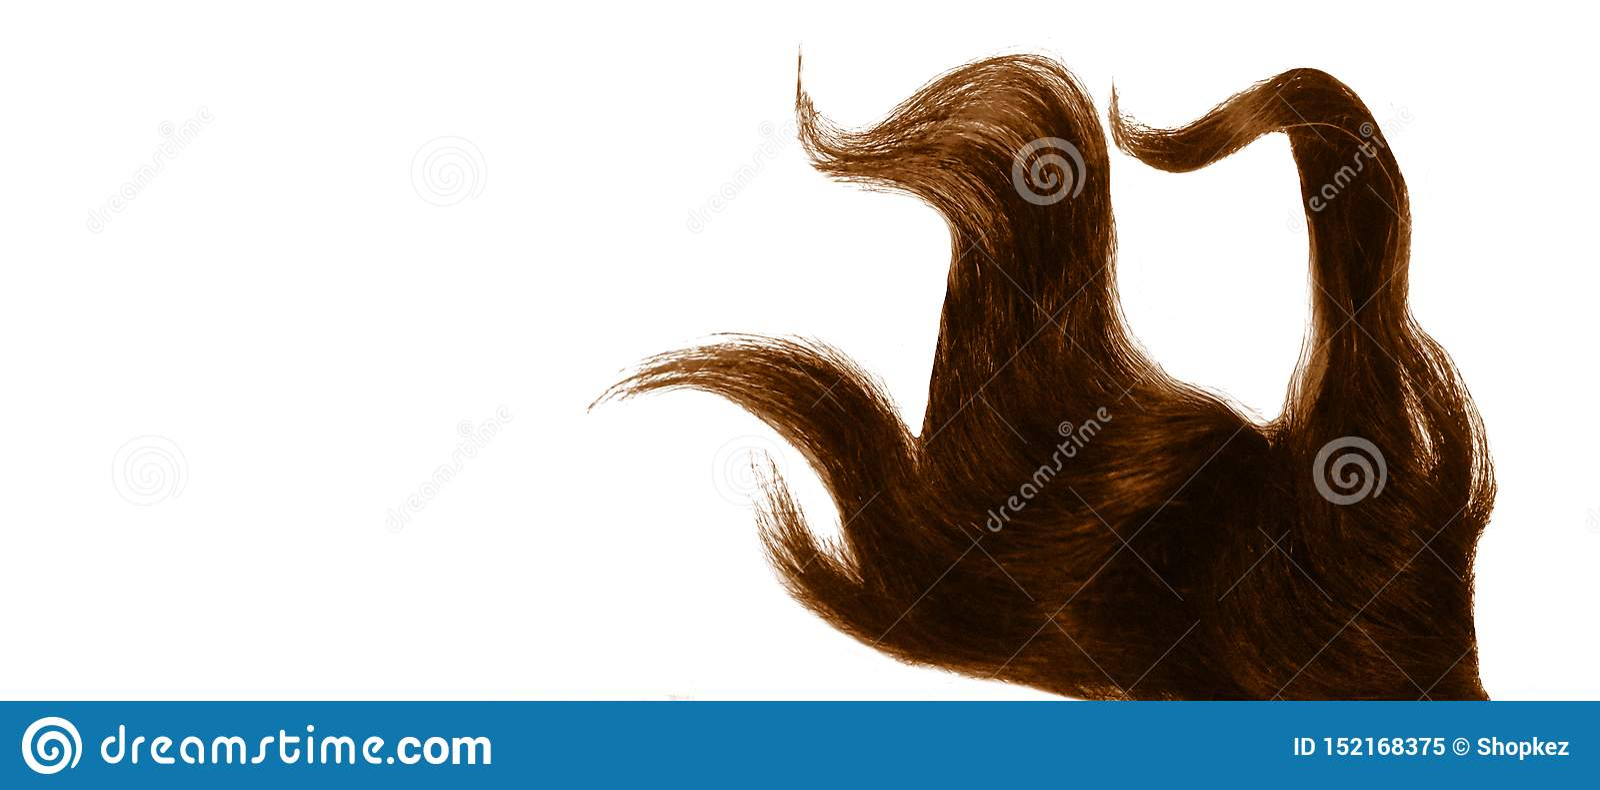 Costa tingida encaracolado do cabelo isolada no fundo branco